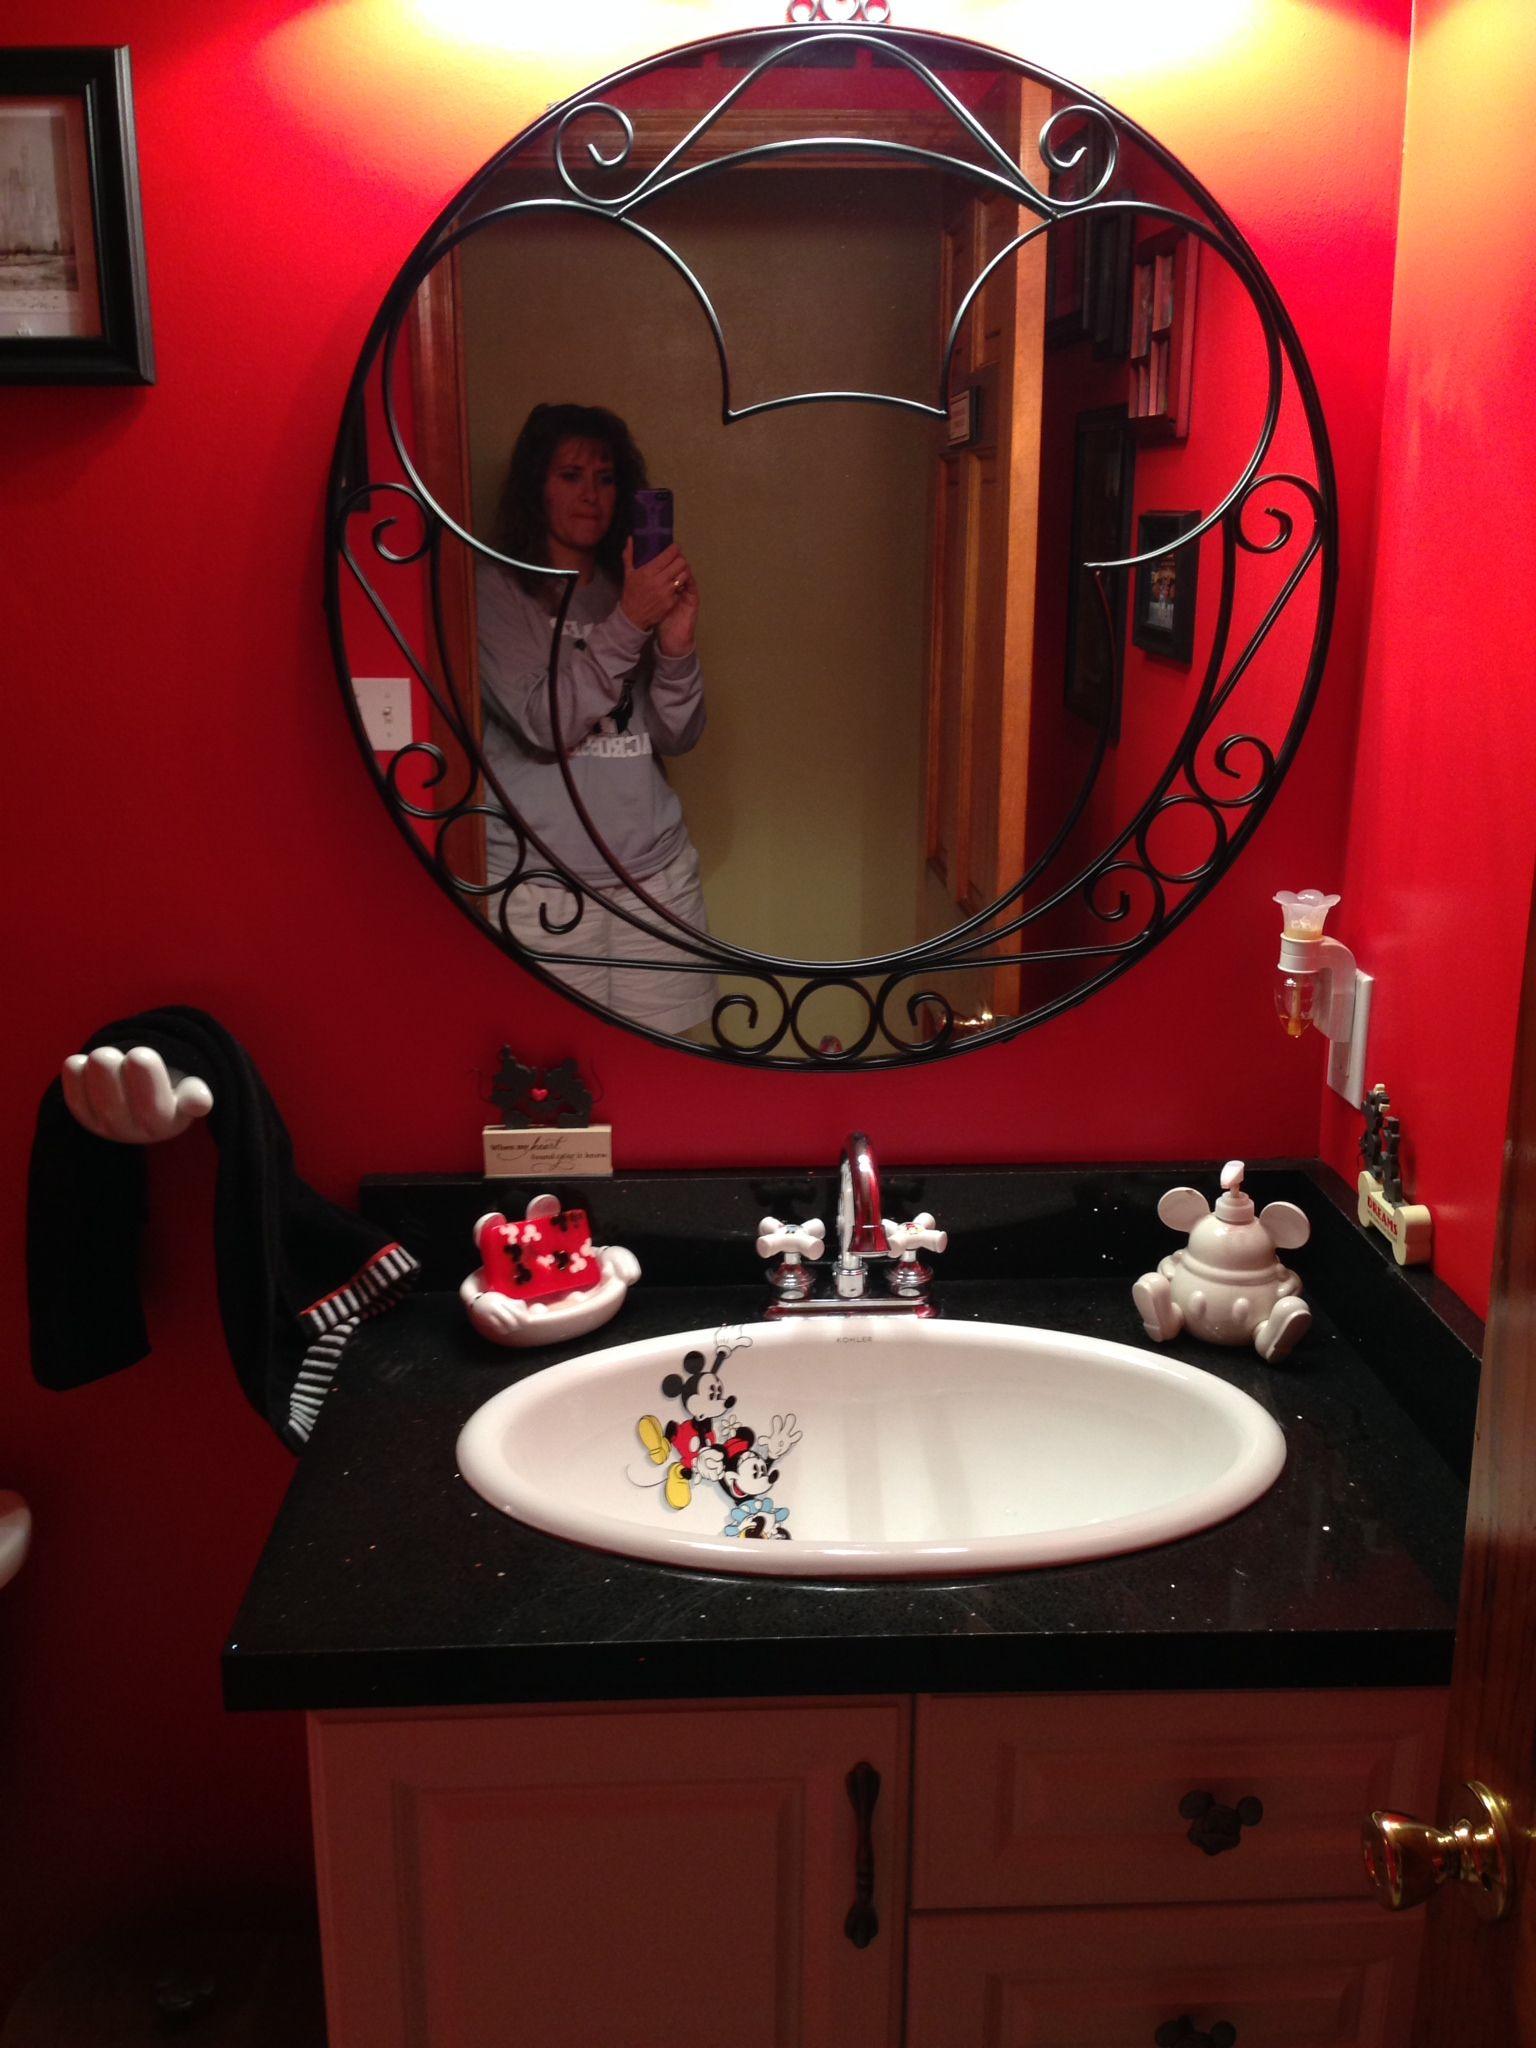 Disney Powder Room Disney Home Decor Round Mirror Bathroom Powder Room